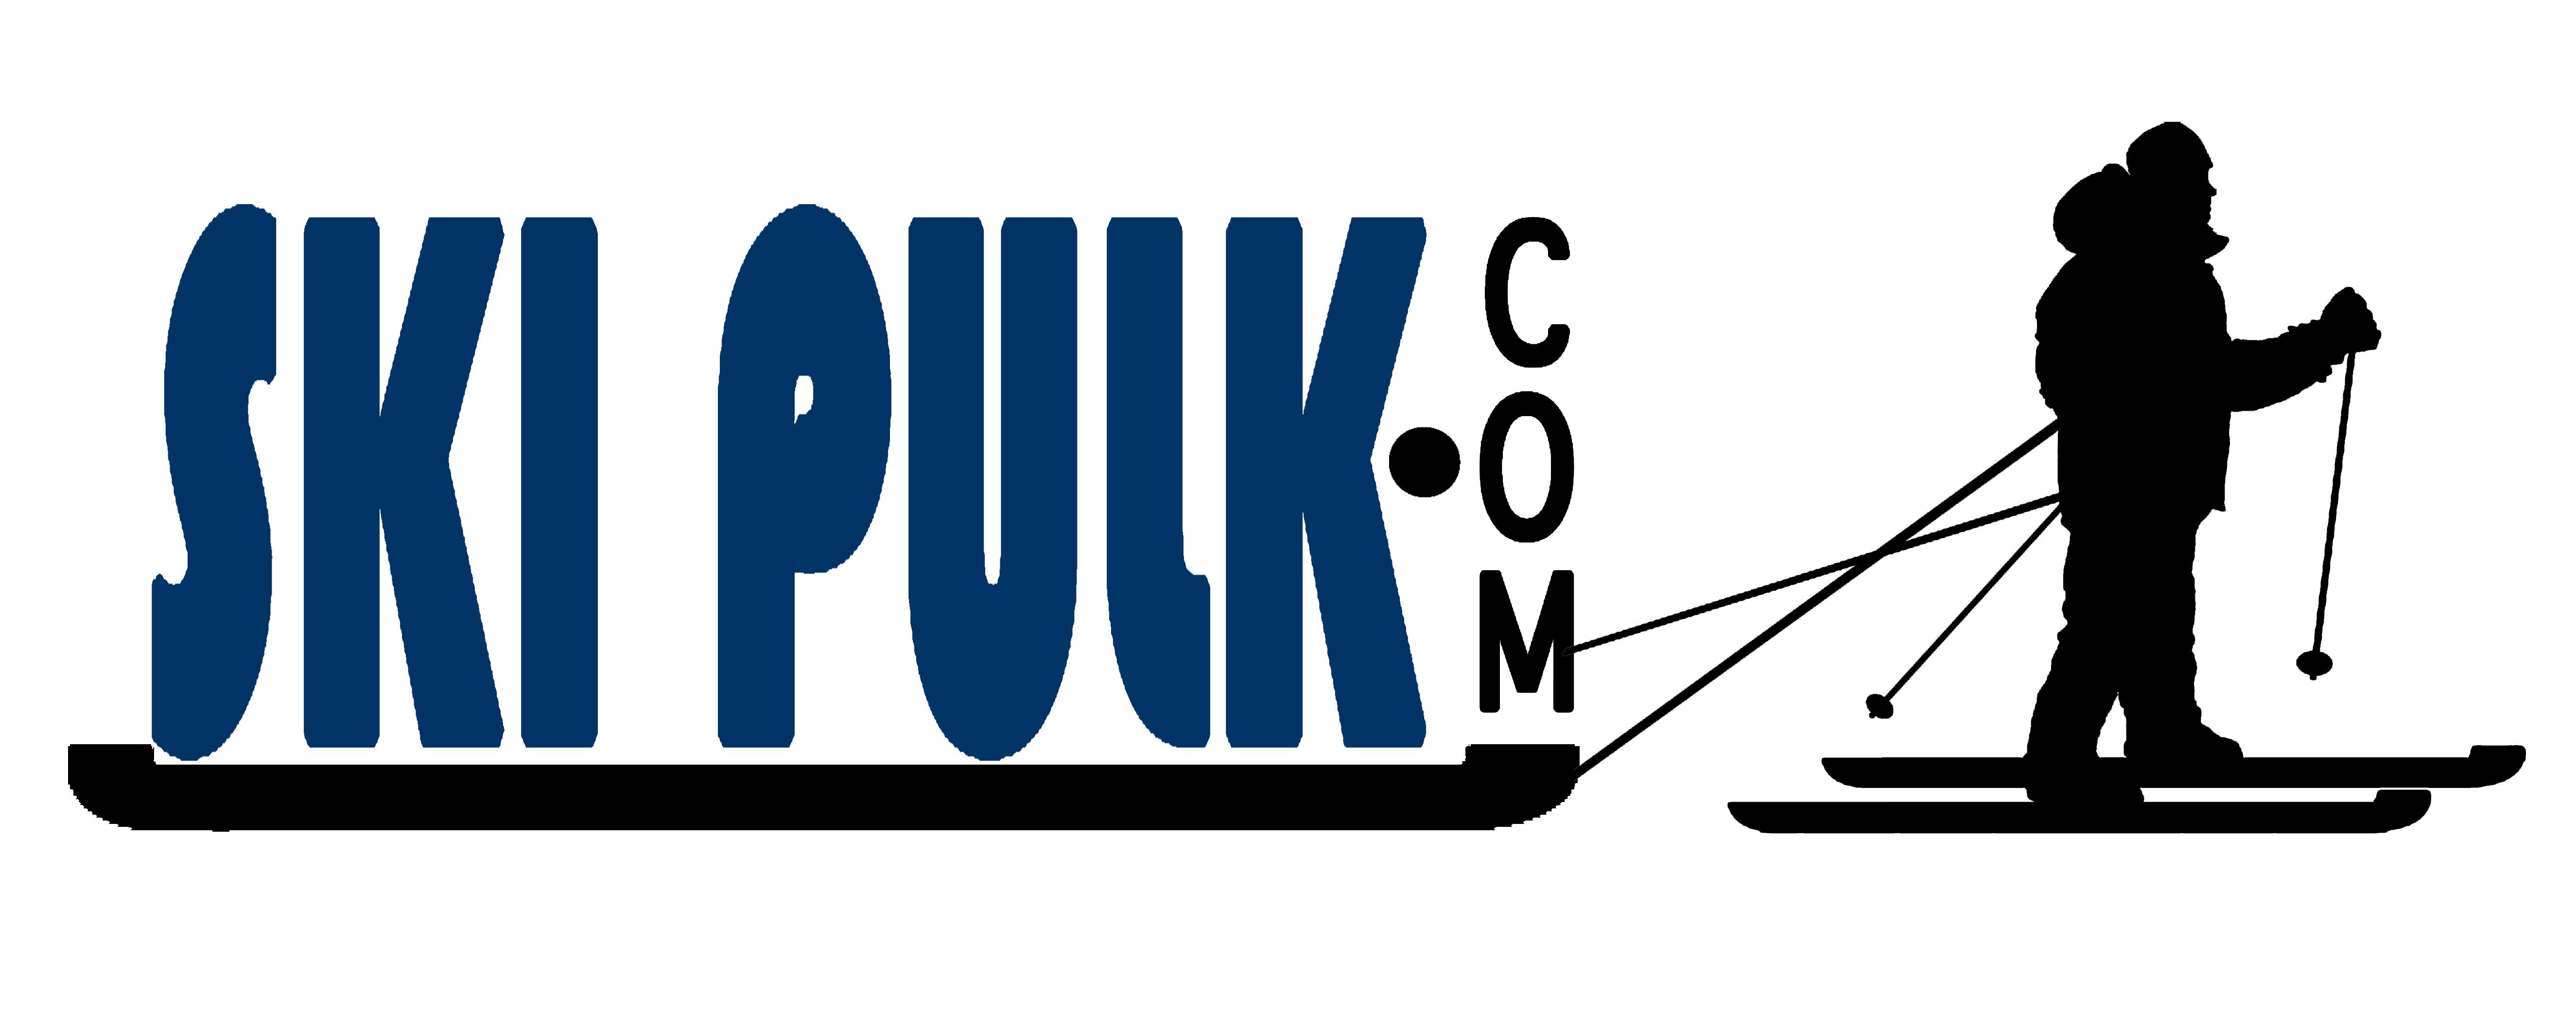 SkiPulk_biglogo